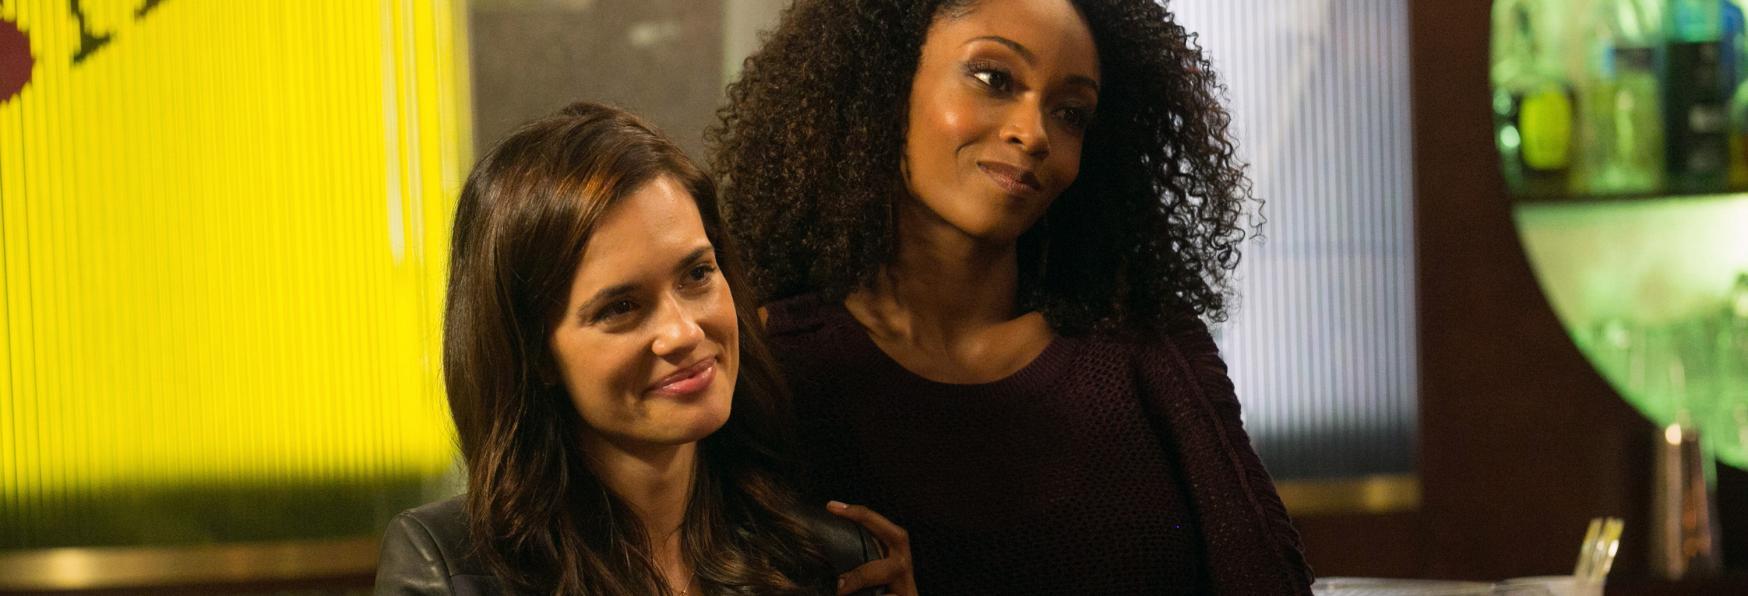 Chicago Med: Yaya DaCosta e Torrey DeVitto salutano la Serie TV dopo 6 Stagioni